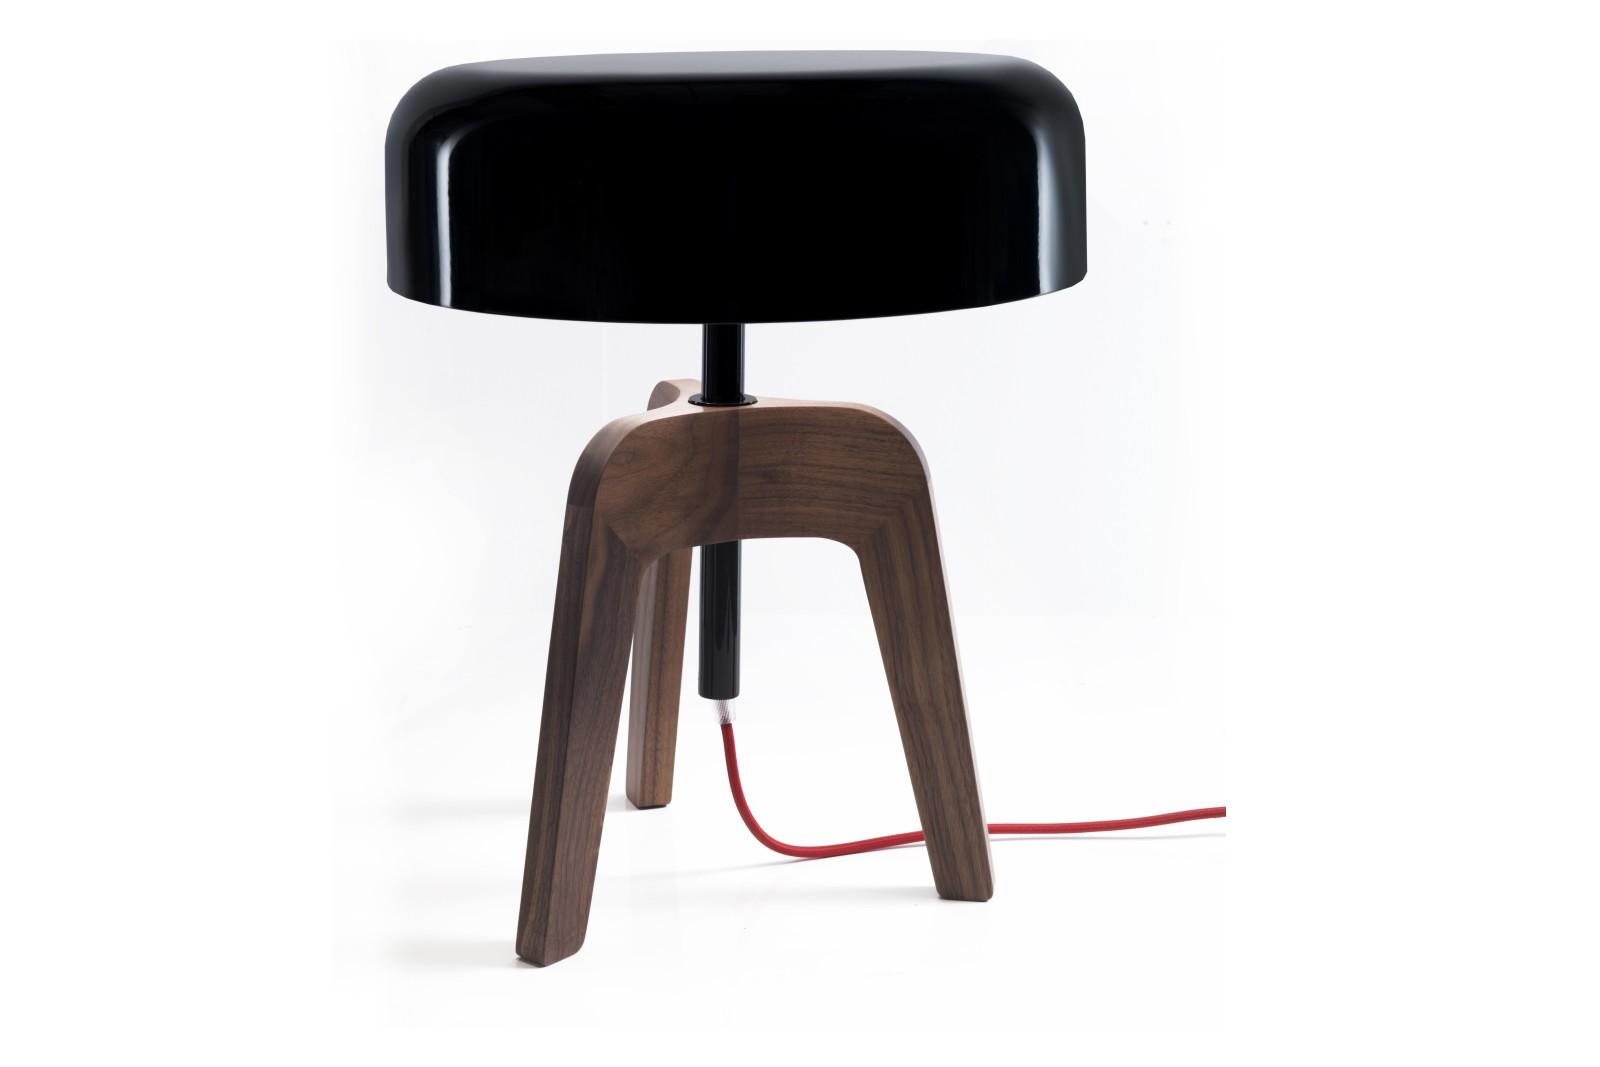 Pileo Table Lamp Black Ral 9005, Canaletta Walnut